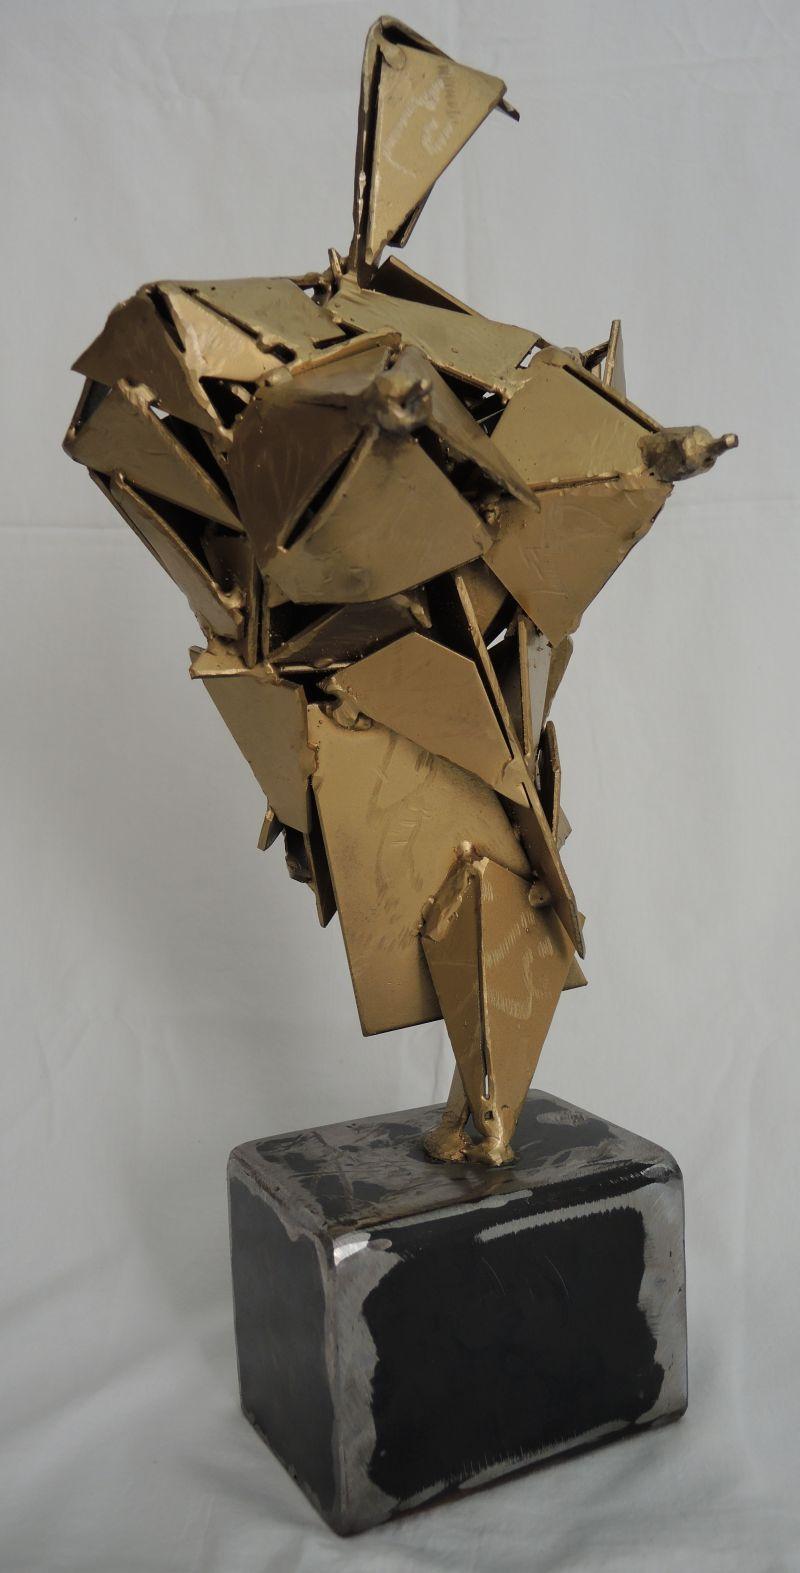 skulptur metall, lackiert